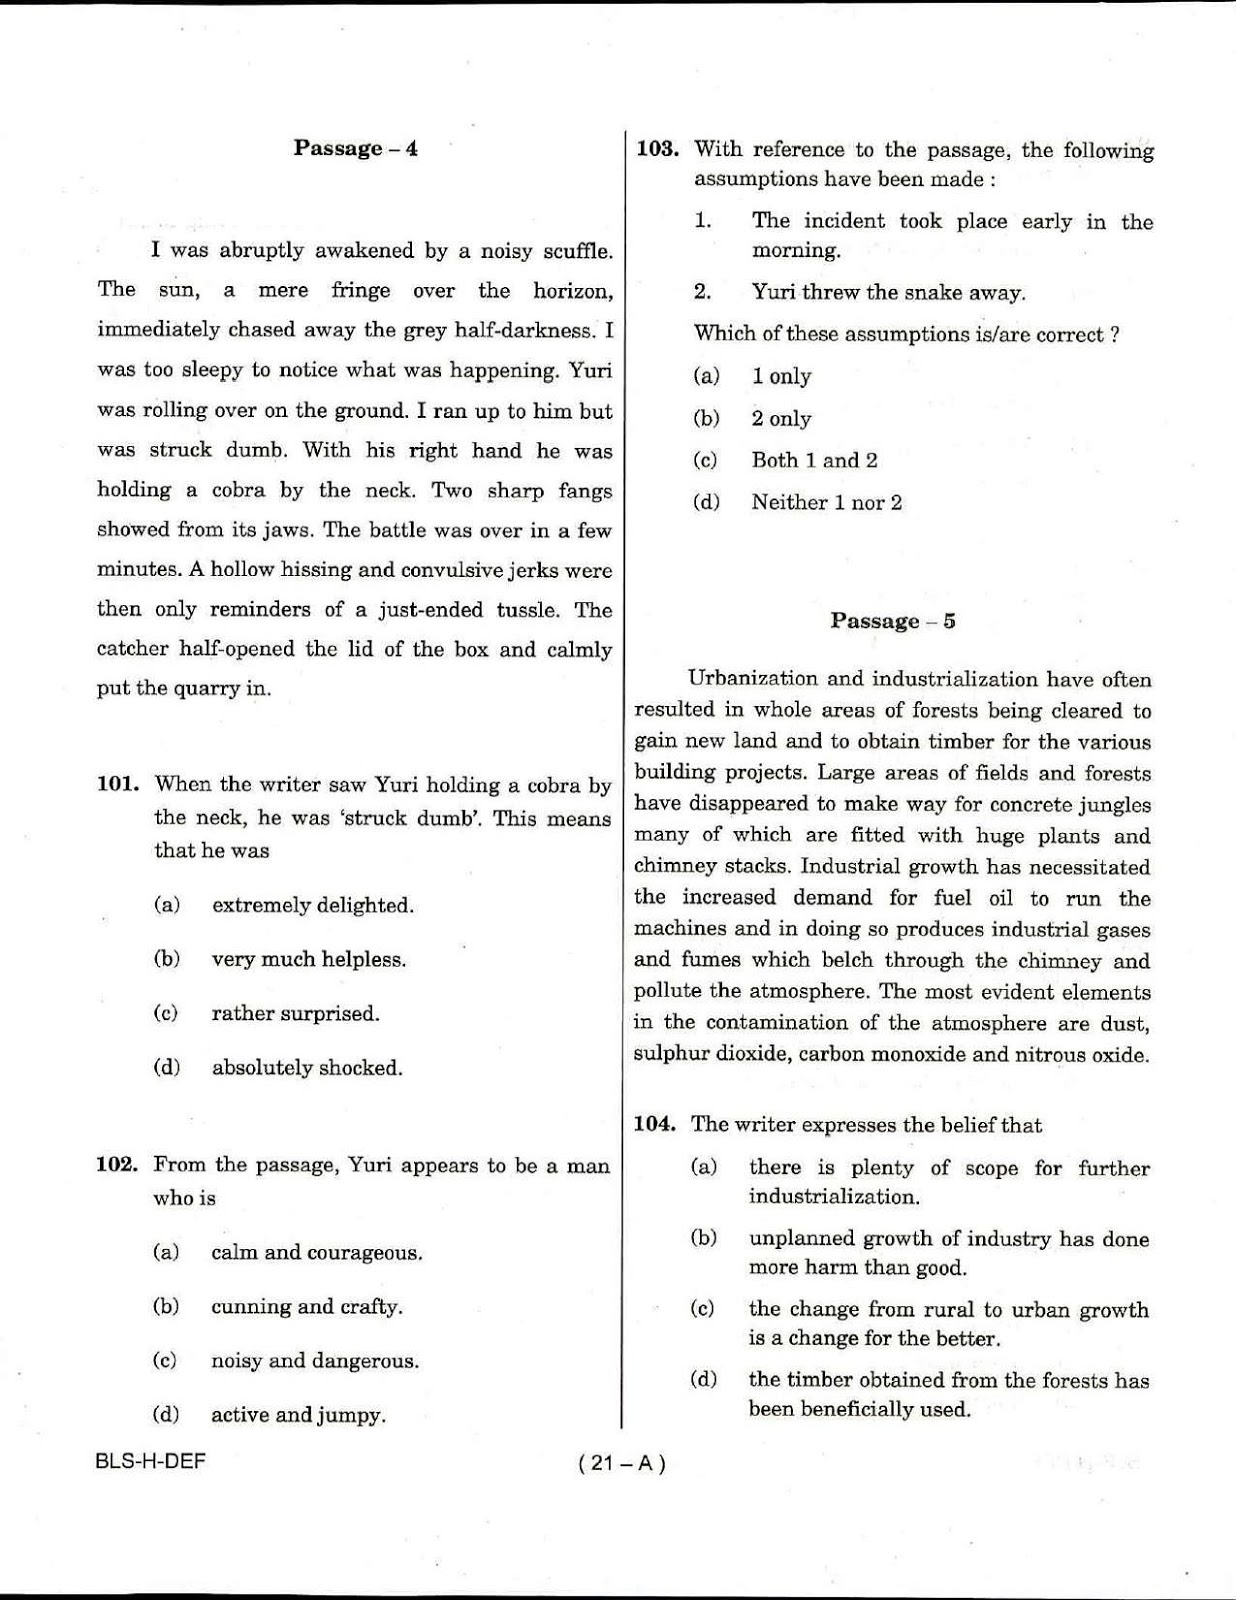 UPSC CDS I 2017 English question paper